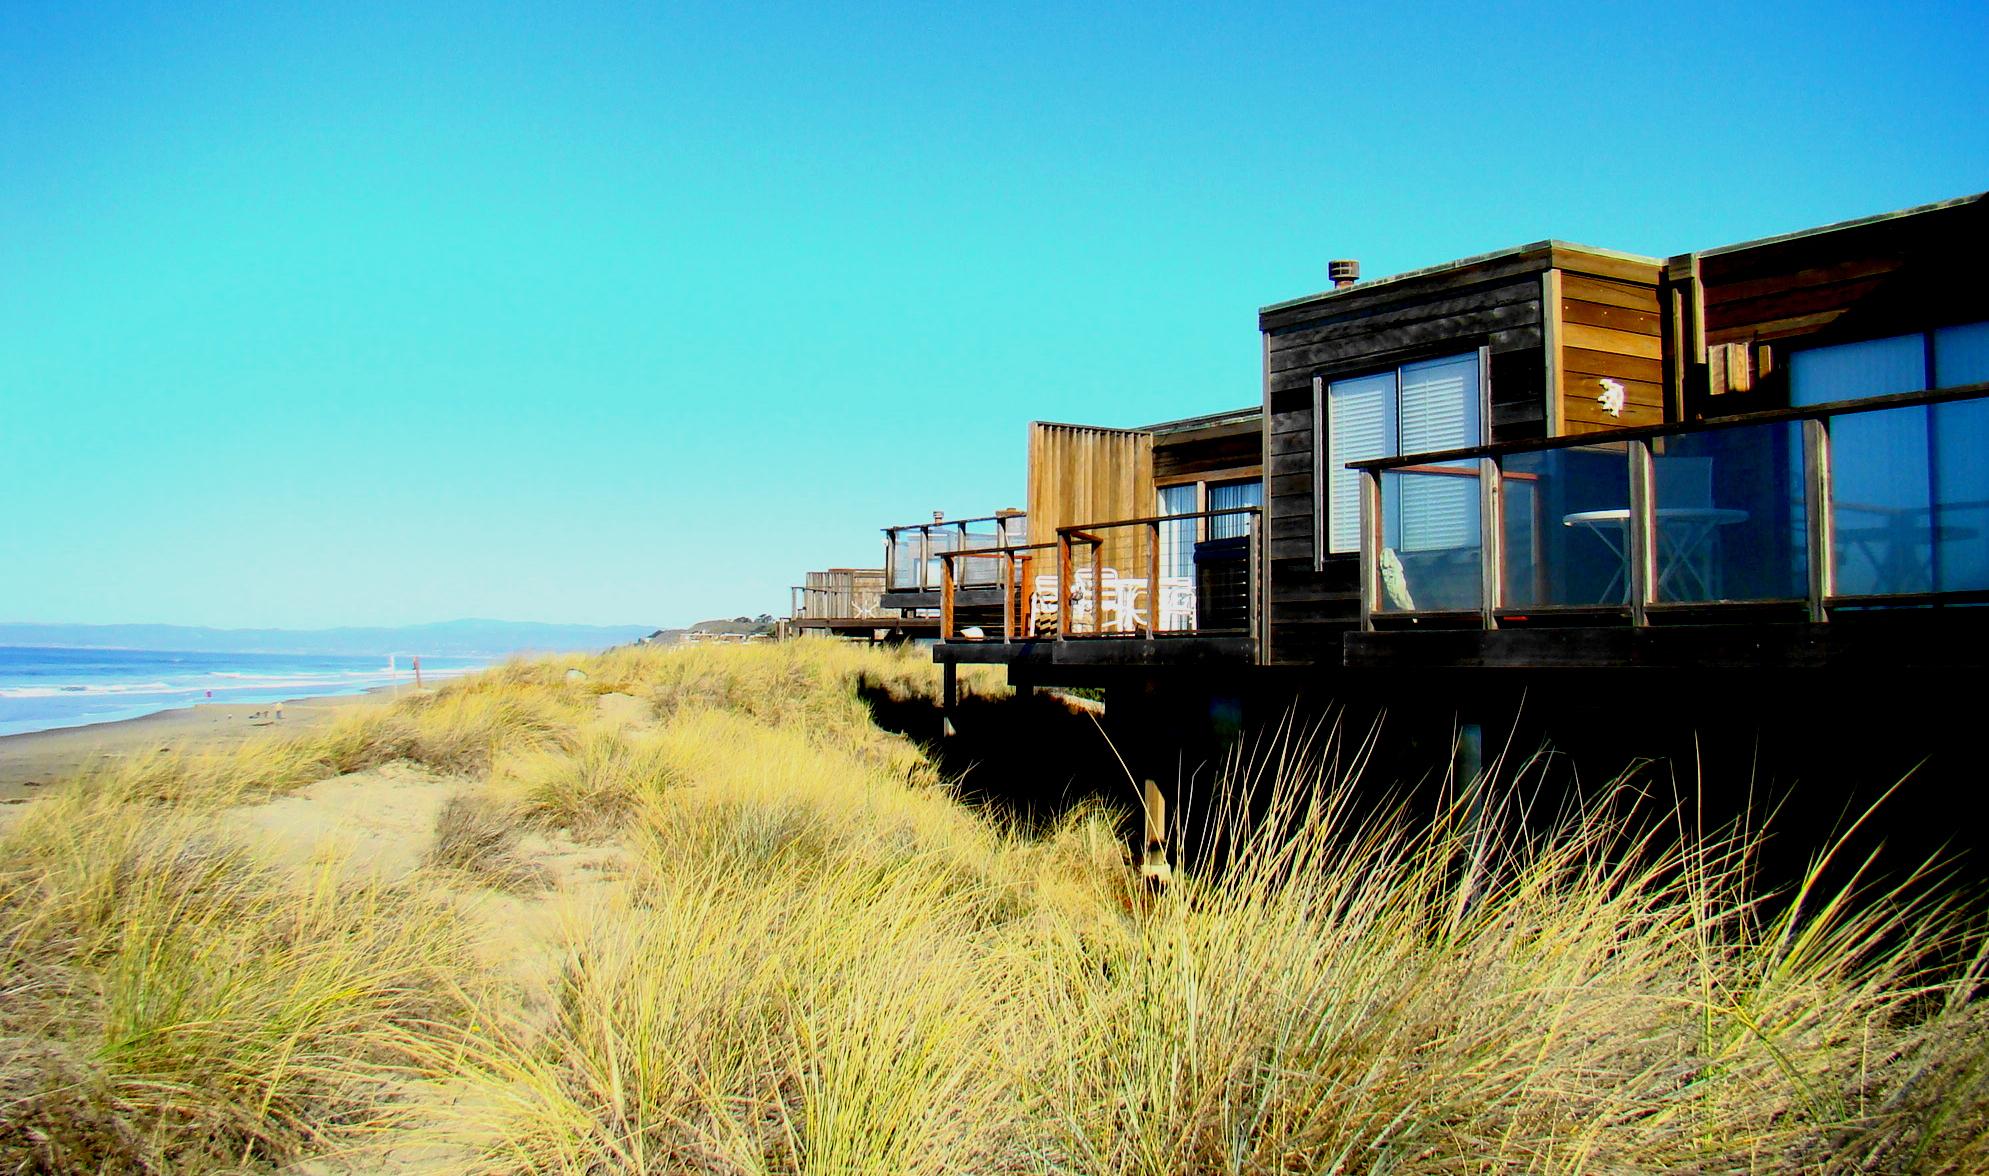 Pajaro Dunes Company and Resort image 5